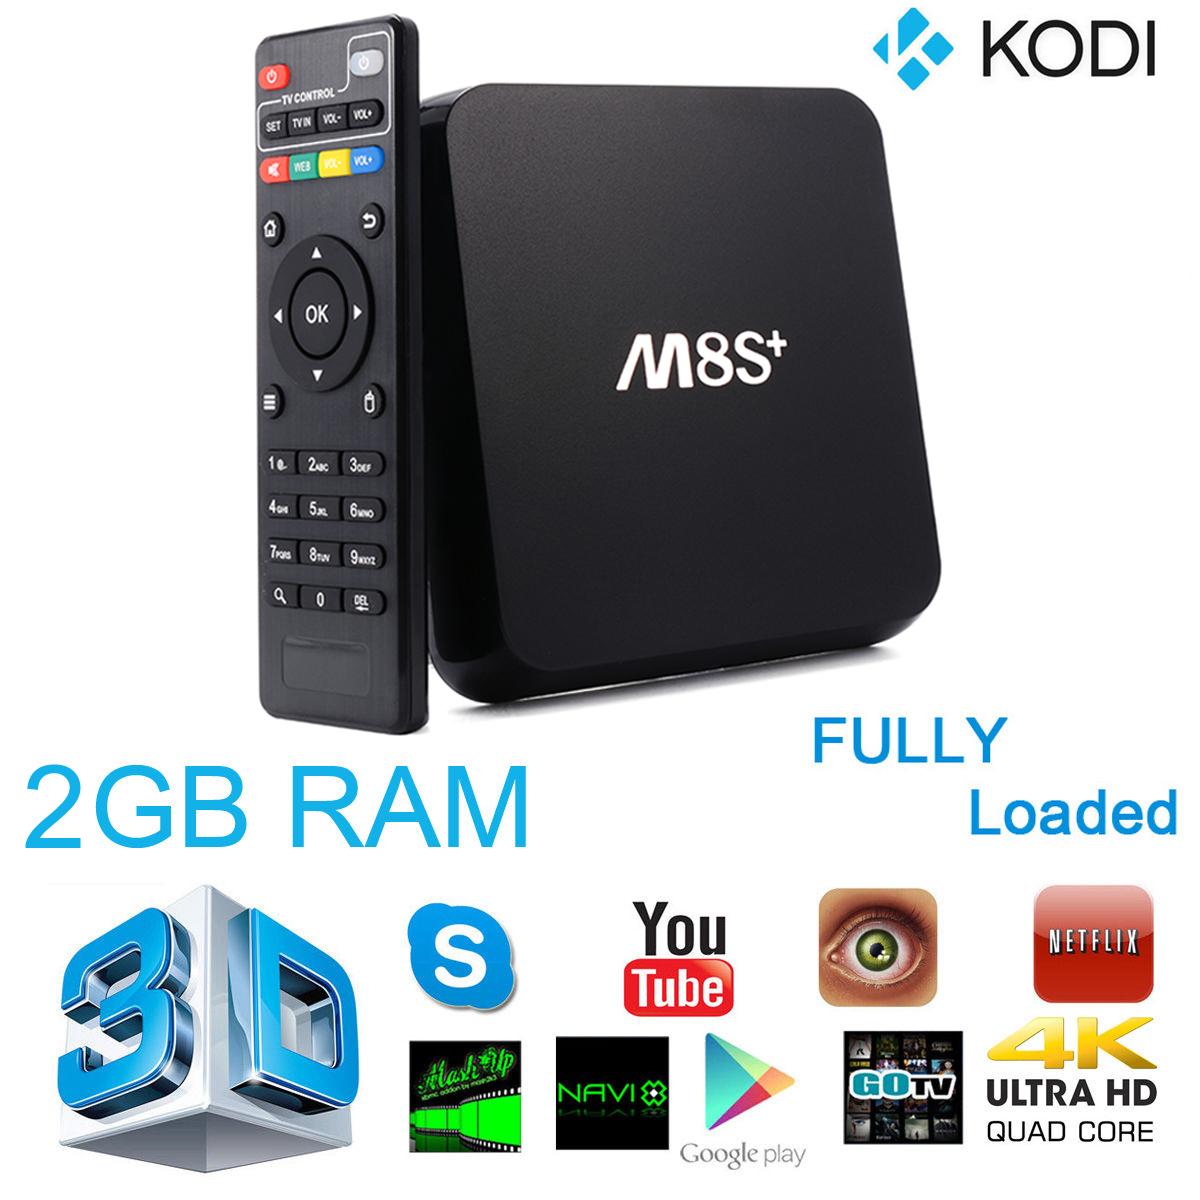 M8S Plug/M8S+ Smart Android 5.1 TV Box Amlogic S812 4K Quad Core 2.4G 5G Wifi Lan 2G/8G Bluetooth 4.0 Kodi Media Player AH126(China (Mainland))